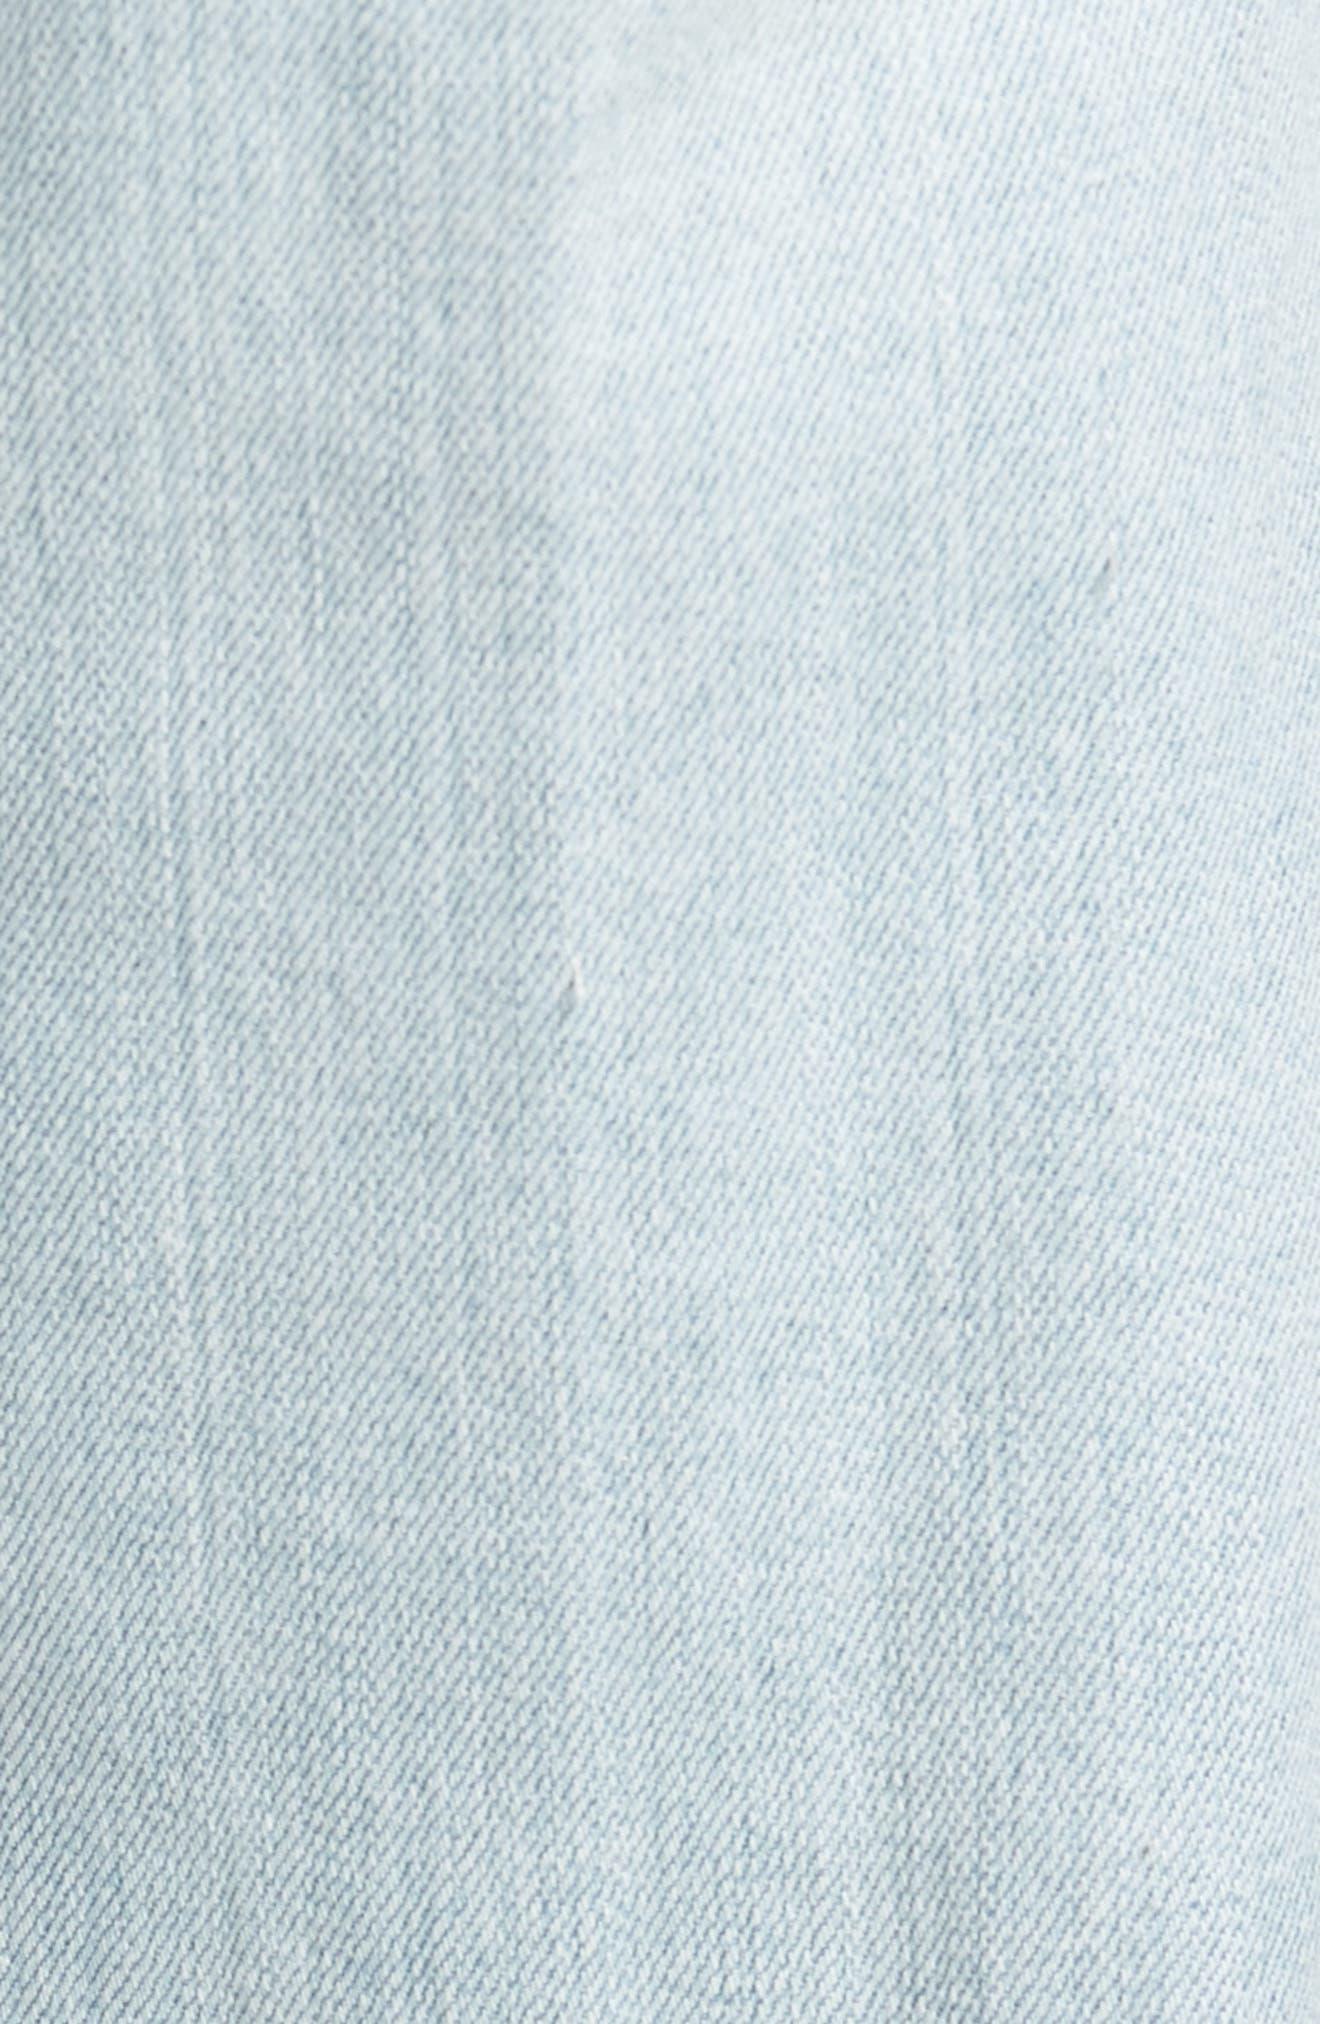 Graduate Slim Straight Leg Jeans,                             Alternate thumbnail 5, color,                             27 Years Bayside